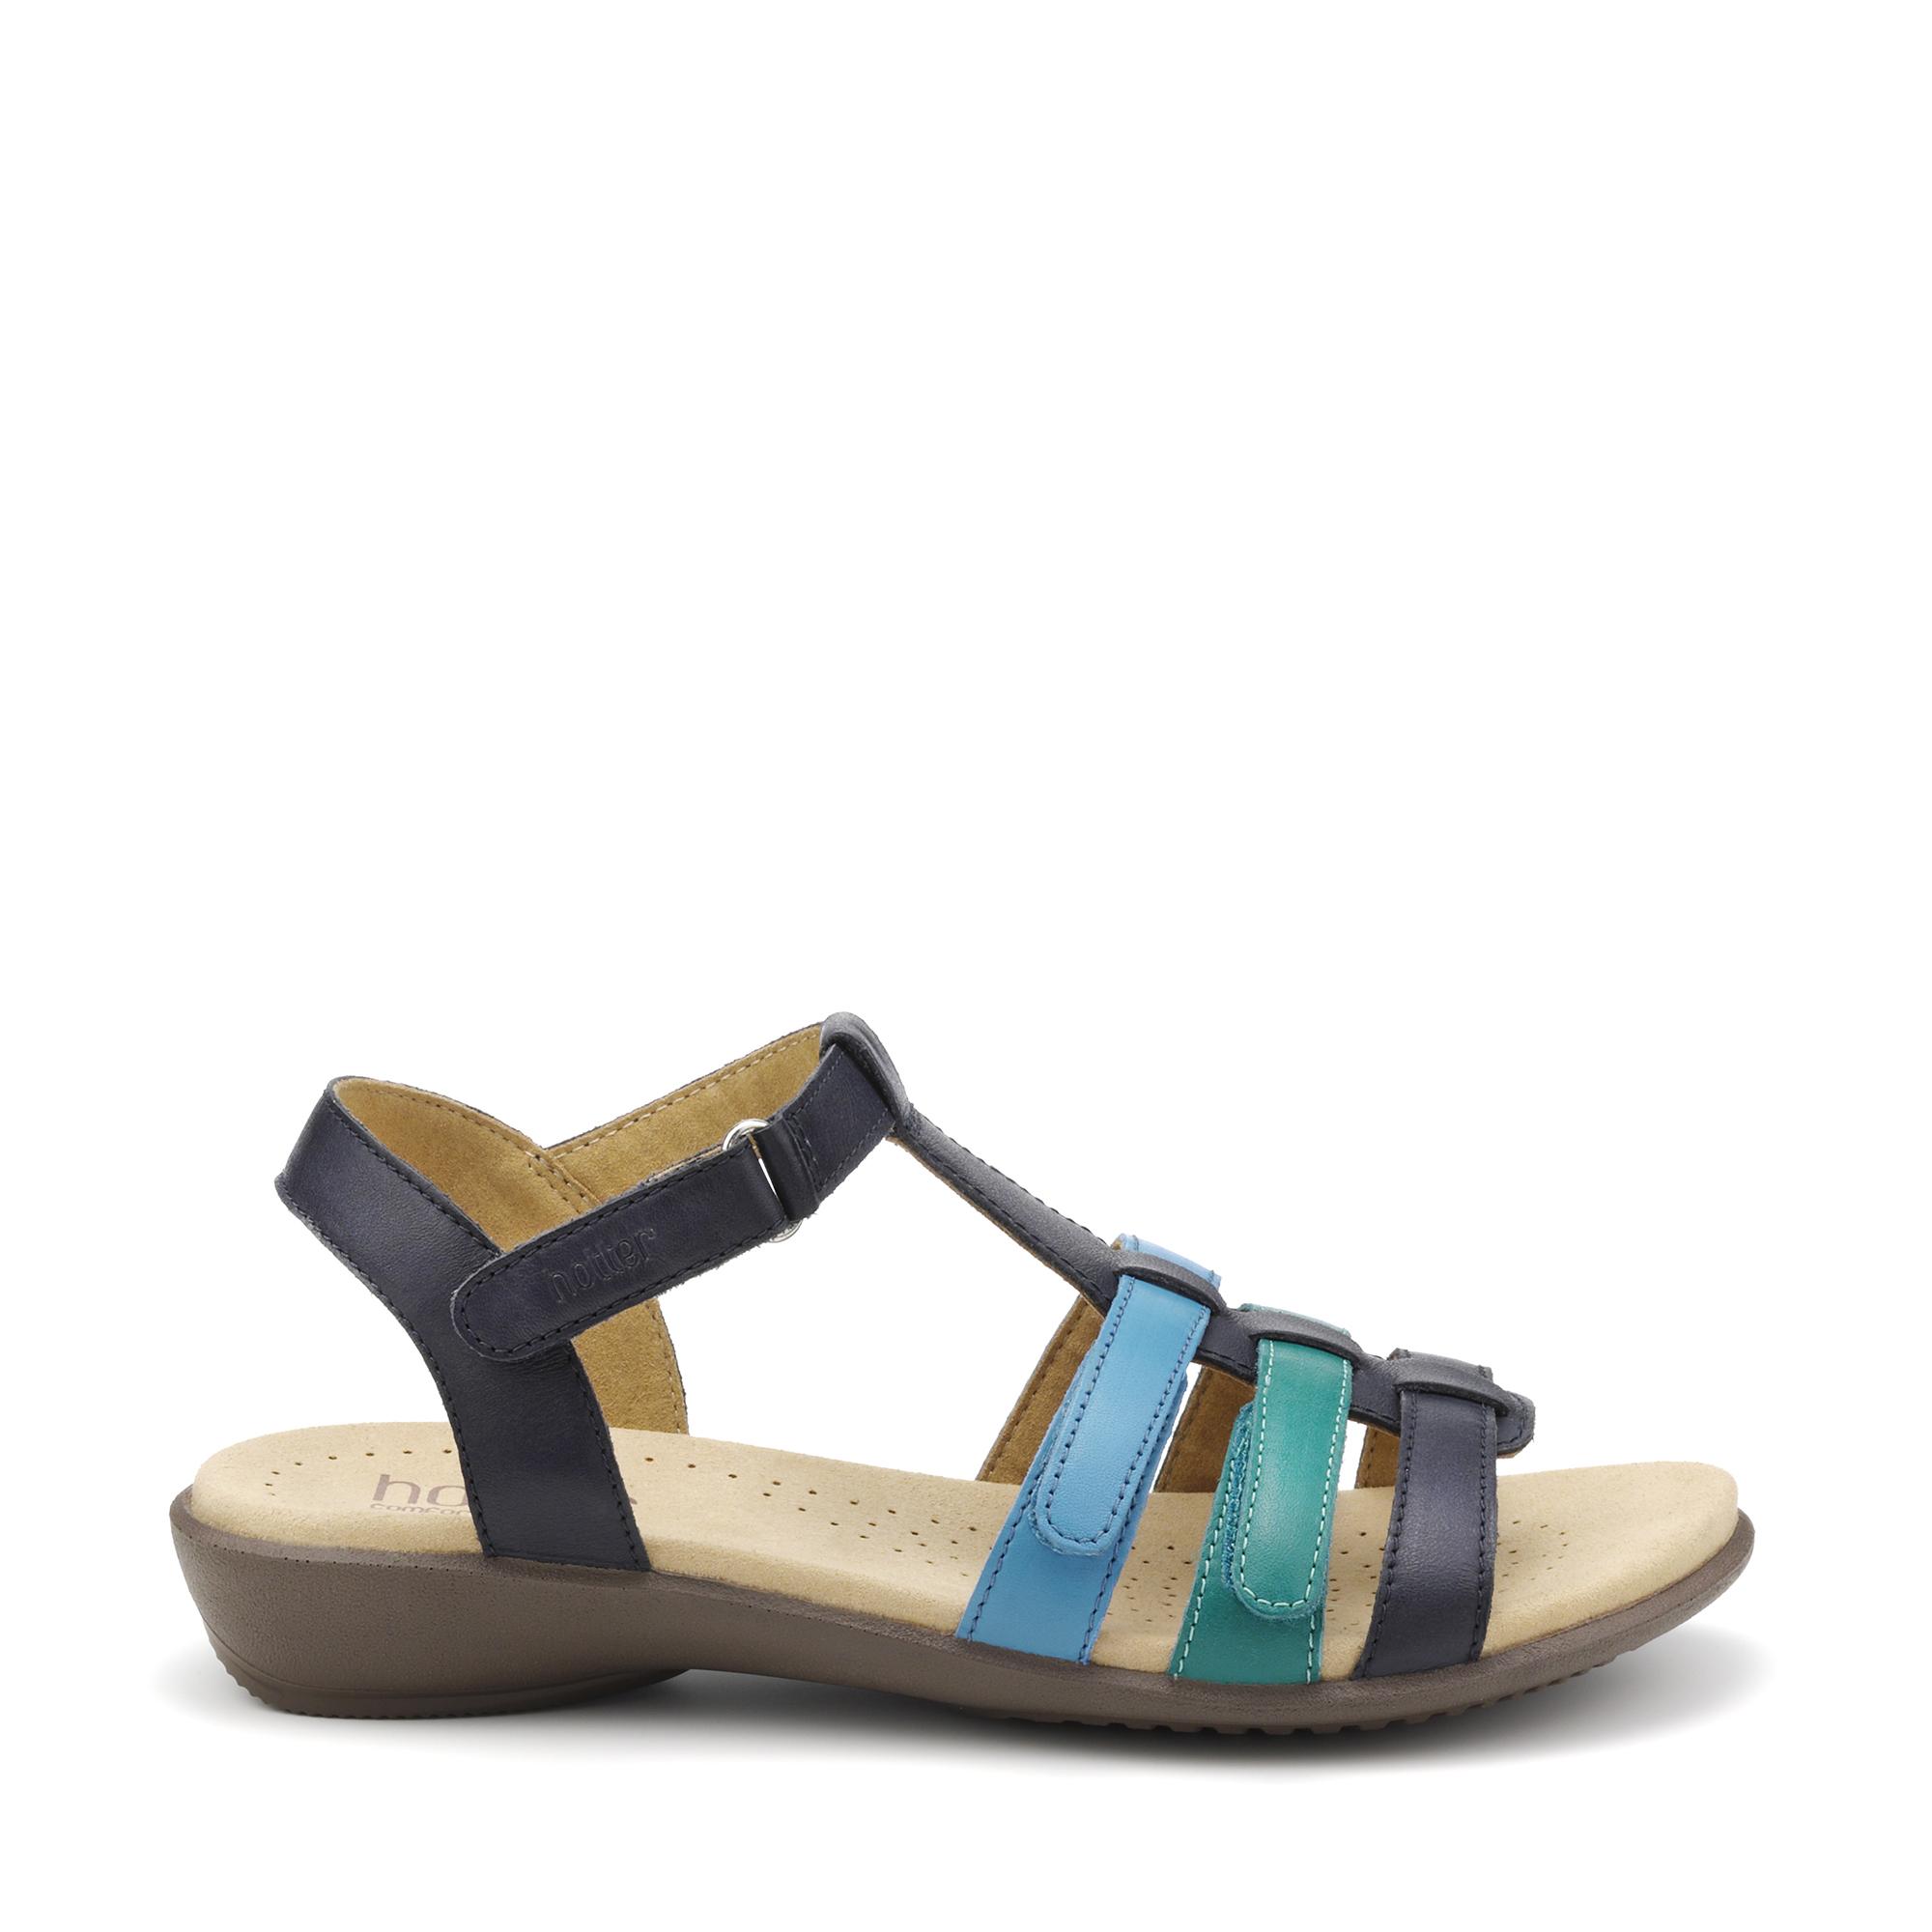 Hotter-Mujer-Sol-Senoras-Bajo-Tacon-Sandalias-Textil-Verano-Casual-Calzado